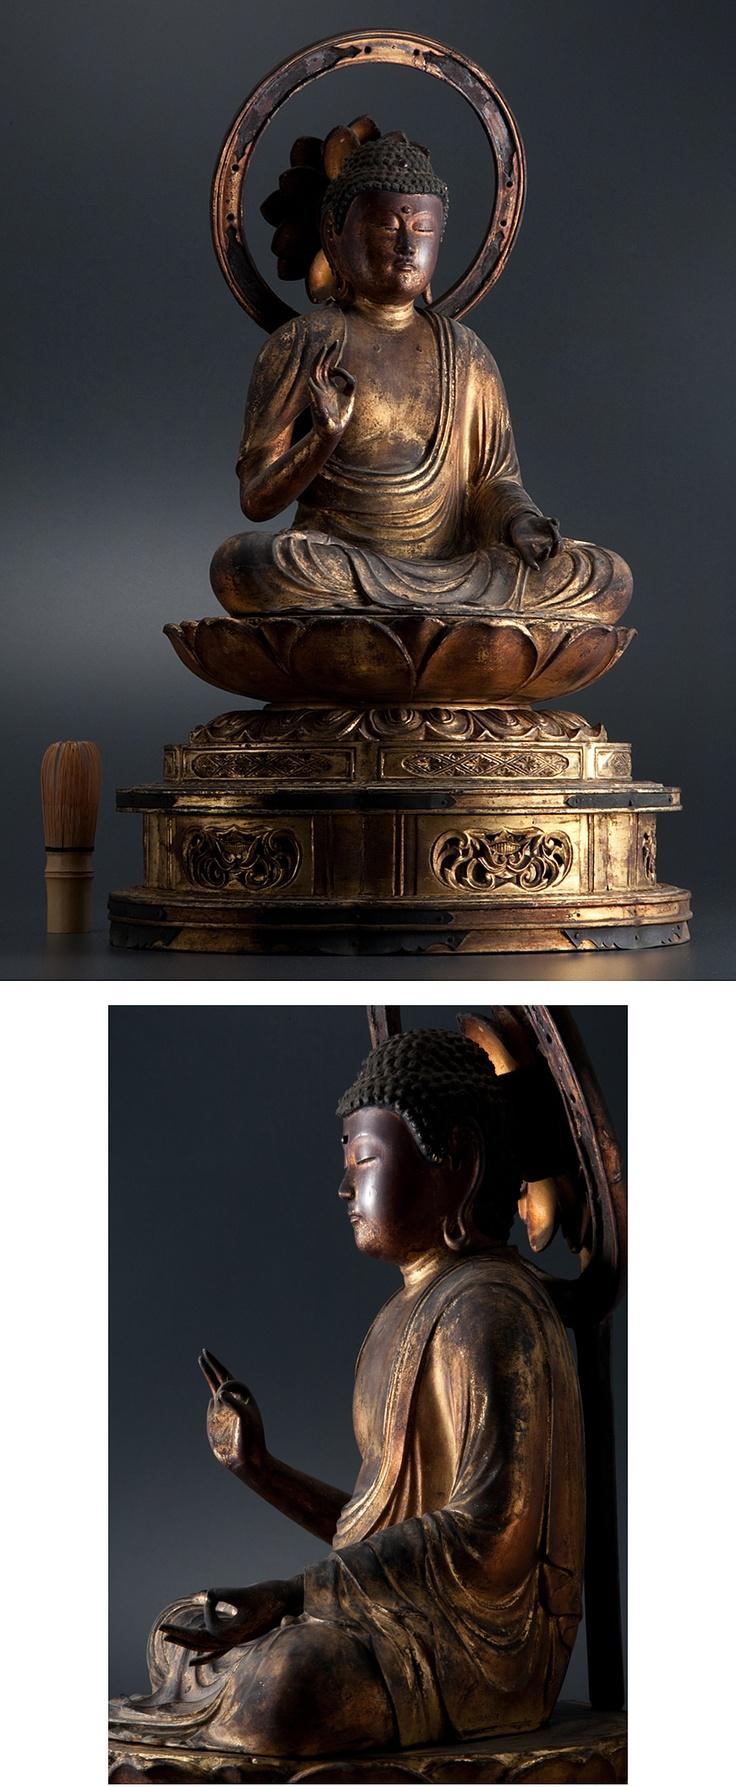 木造阿弥陀如来座像, at auction.